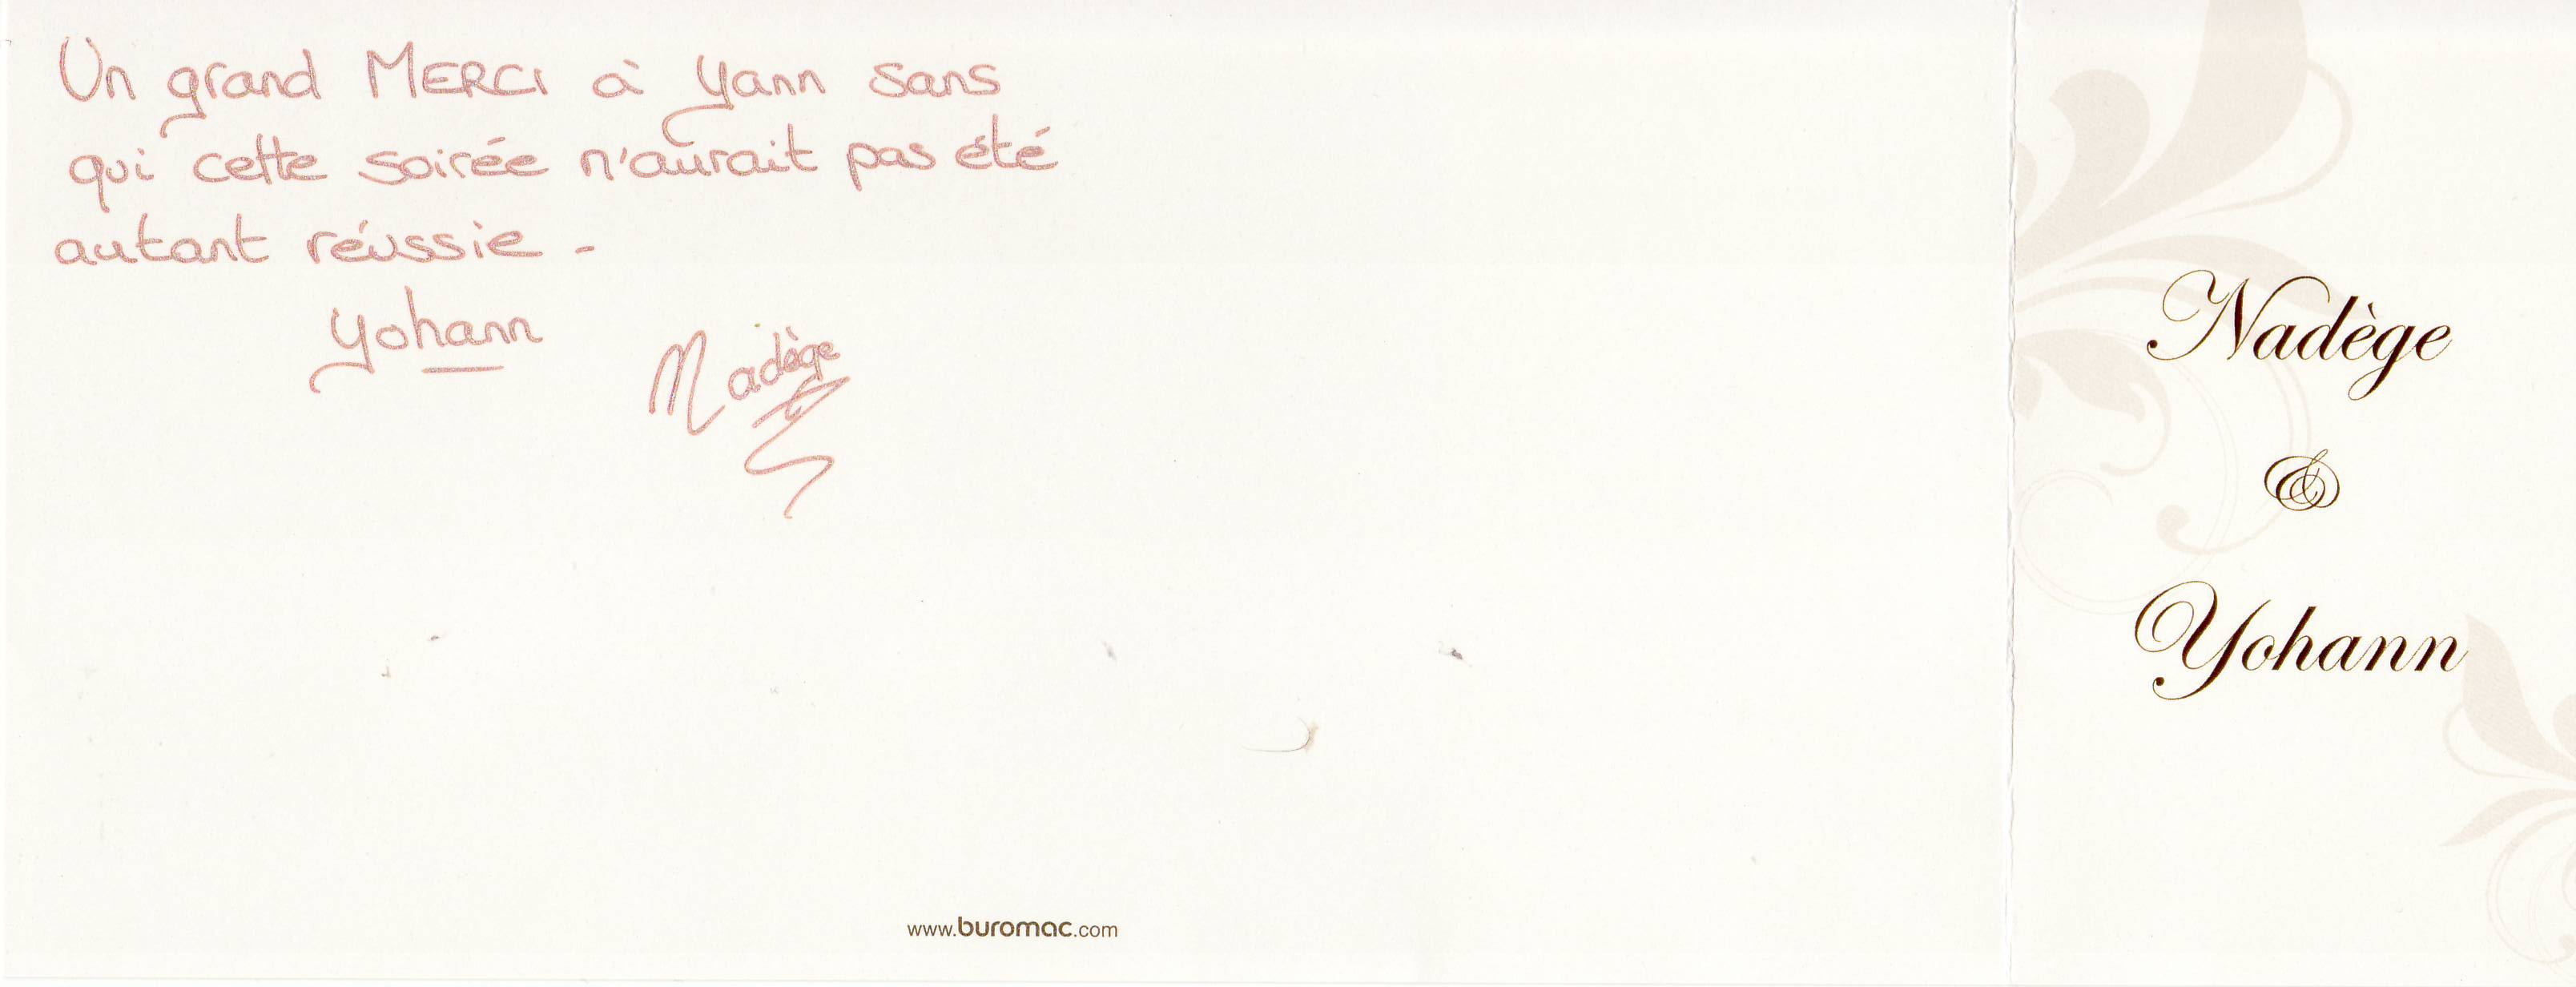 Mariage_MEDER_Yohann_&_Nadège_(Chartreuse_de_Pomier)_(06-10-2012)_2